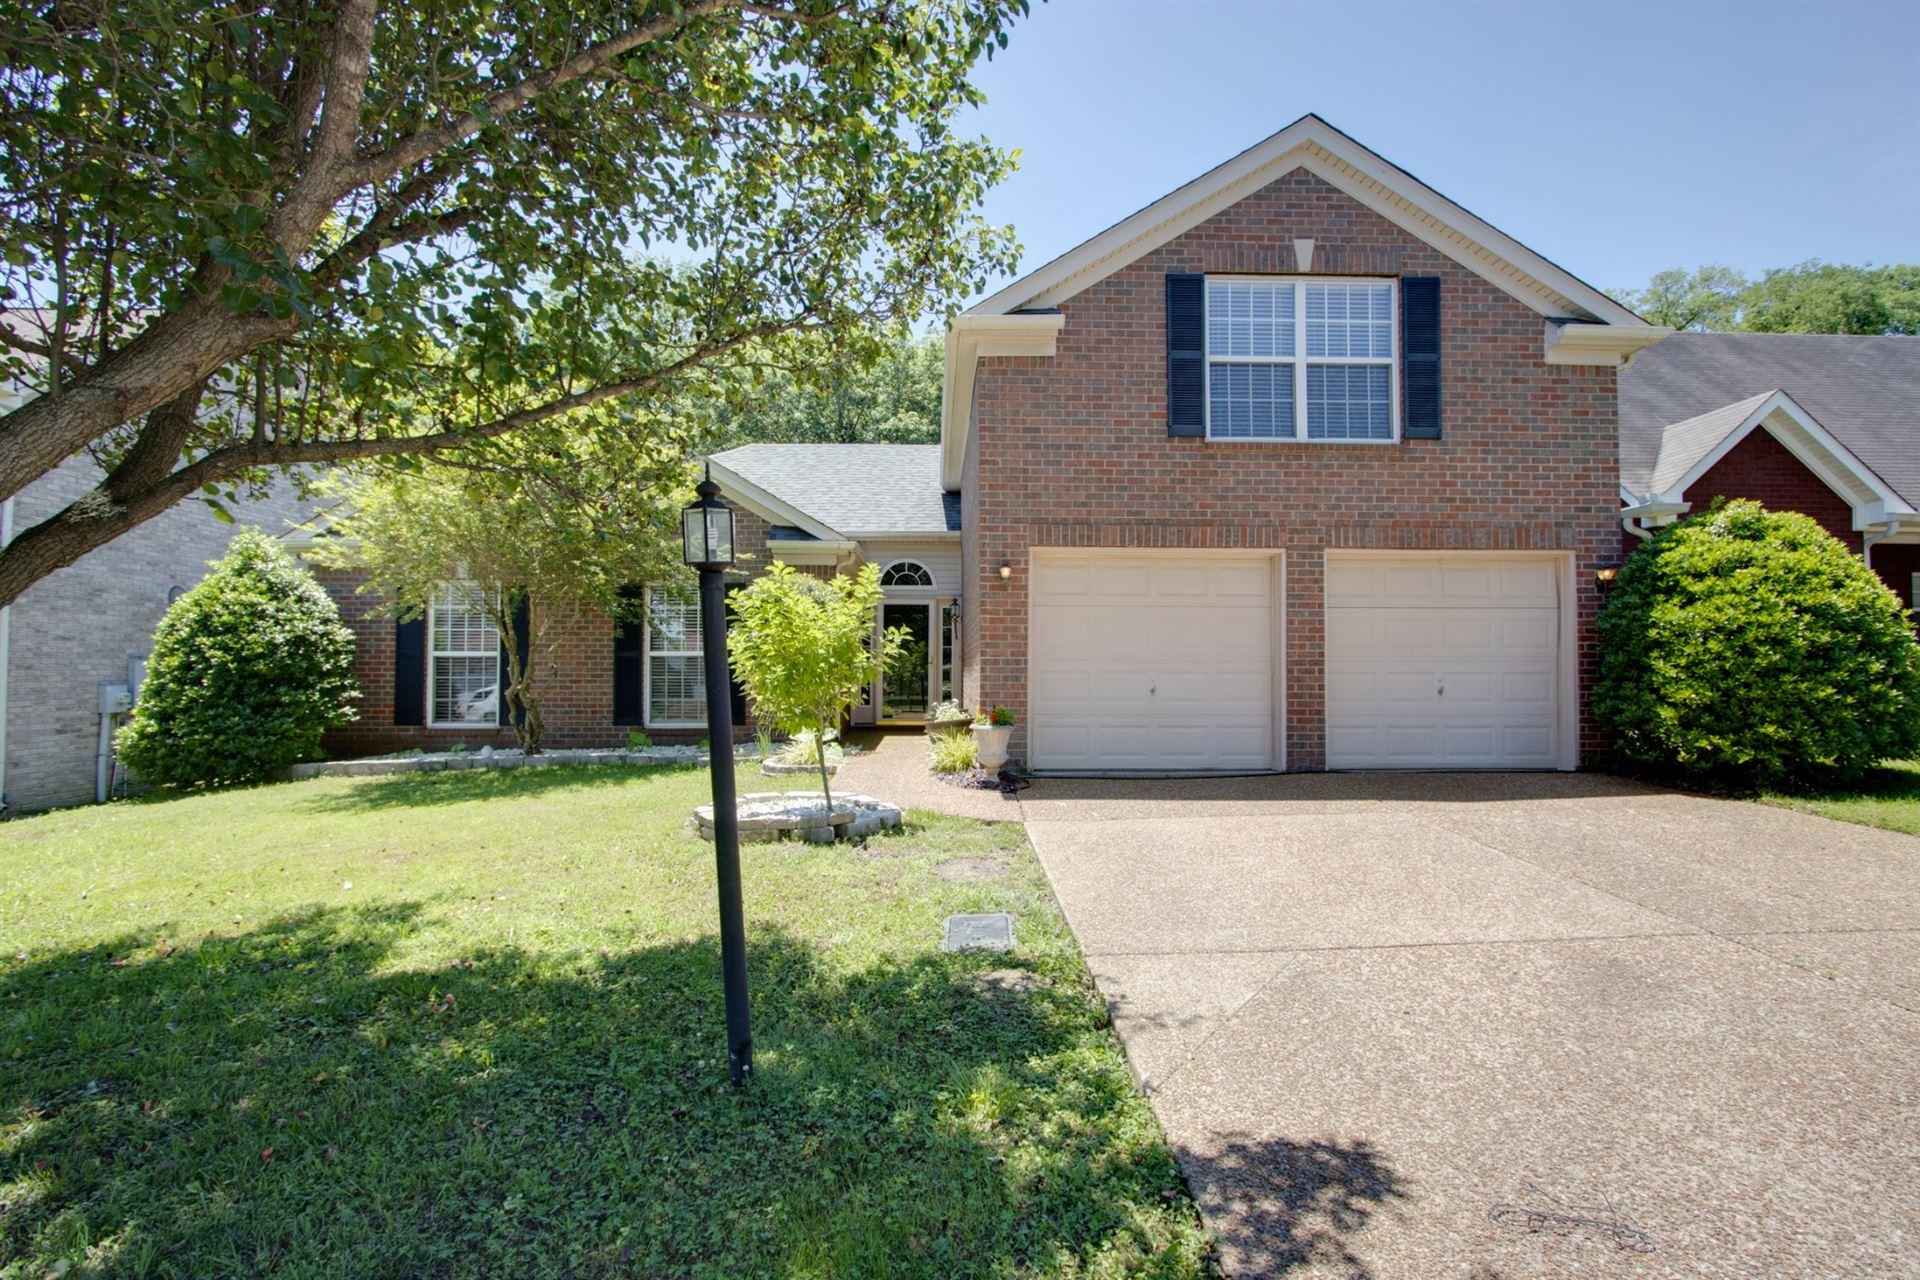 1672 Glenridge Dr, Nashville, TN 37221 - MLS#: 2263301